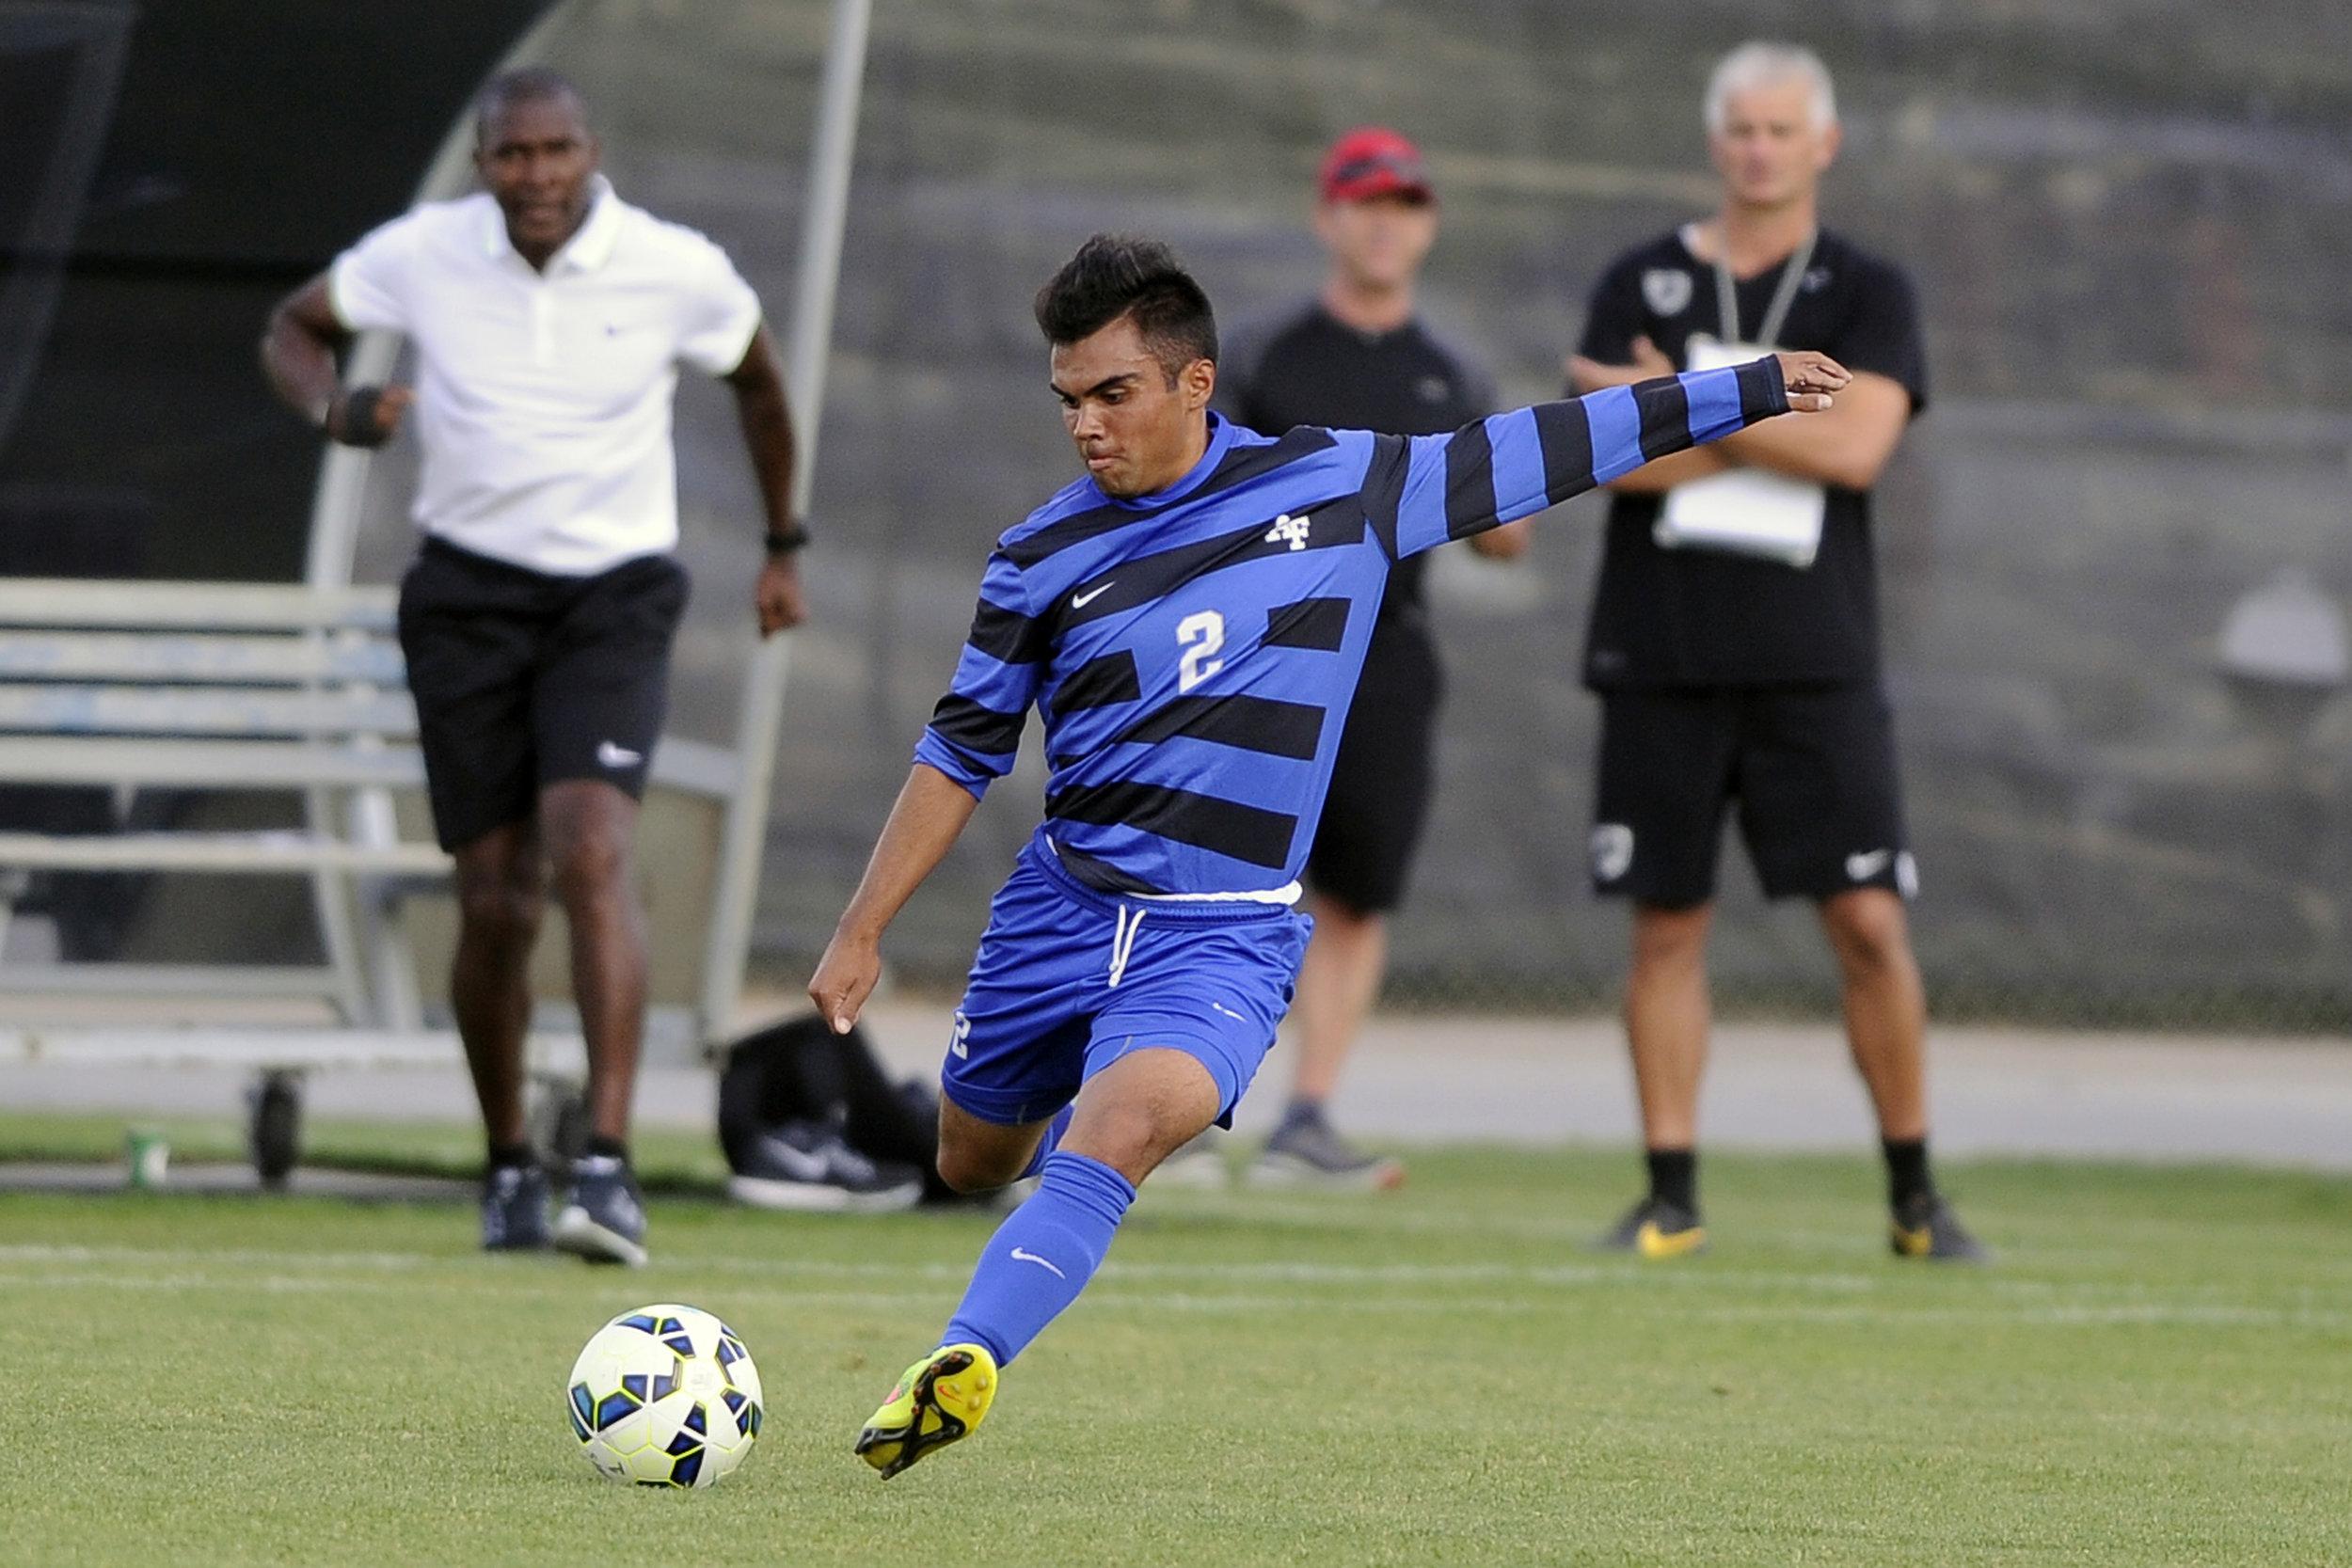 soccer-pass.JPG